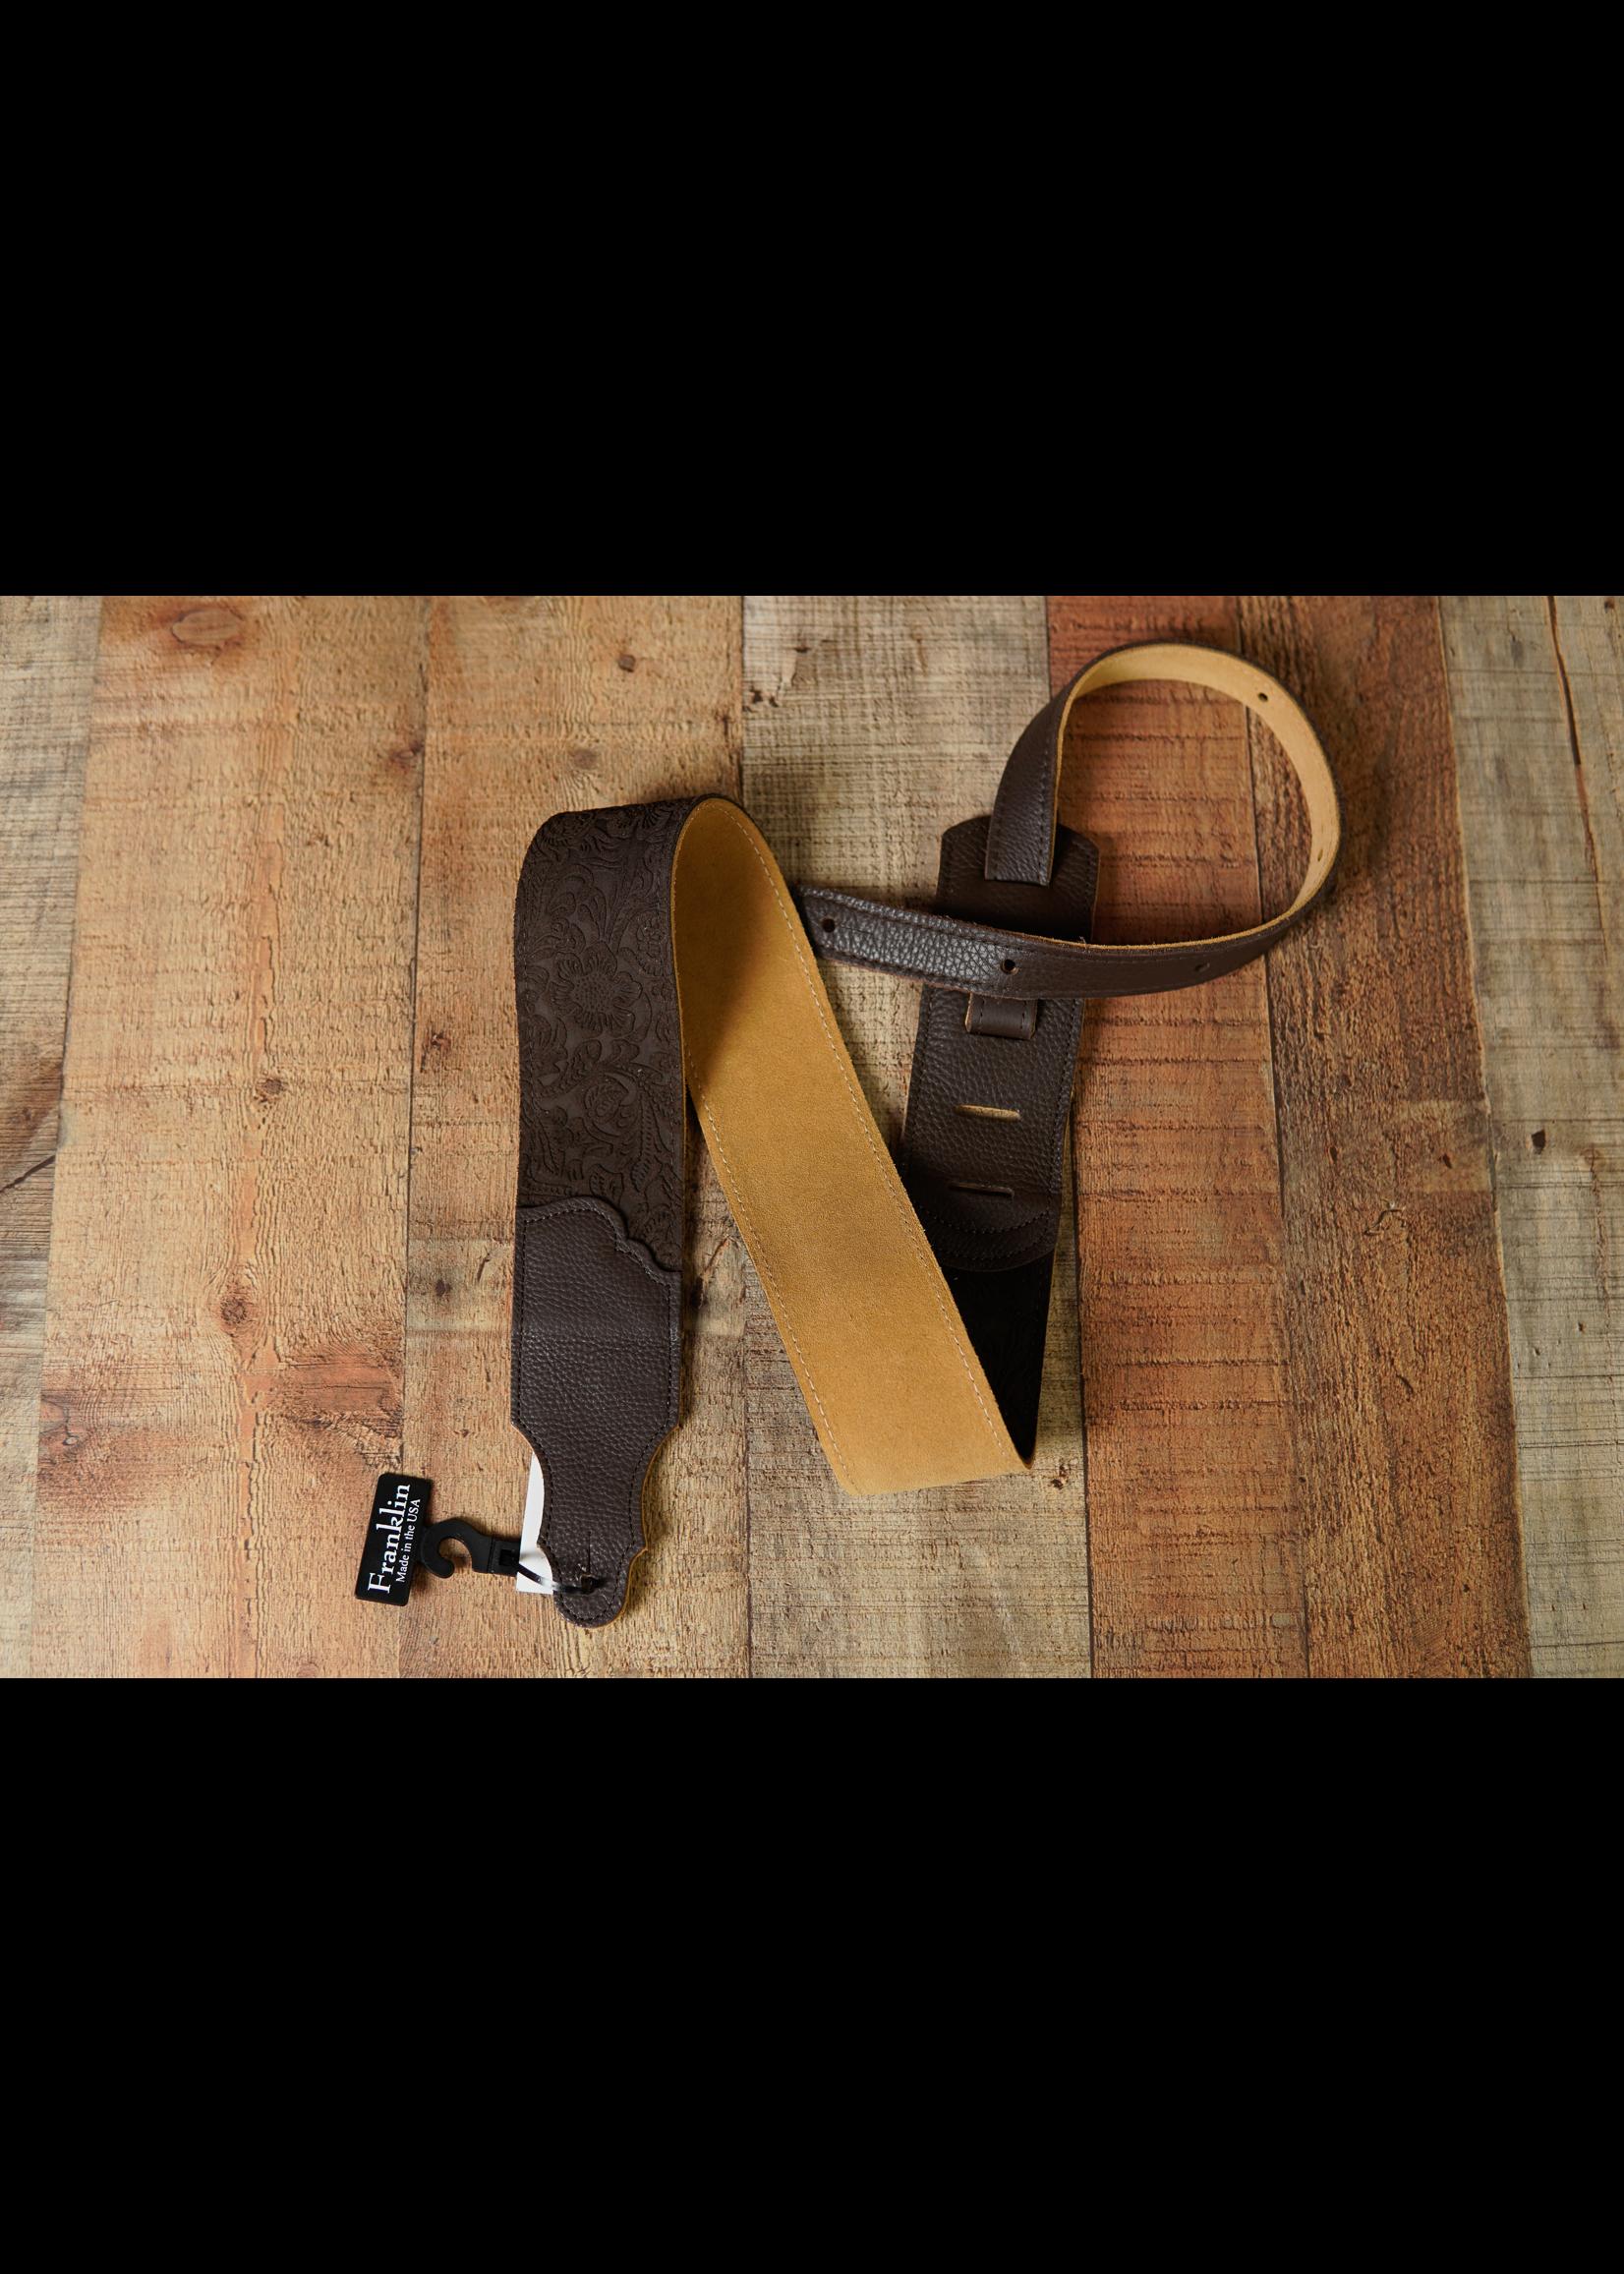 "franklin Franklin 2.5"" Embossed Suede/Glove Leather EndTab/Choc/Choc End Strap"